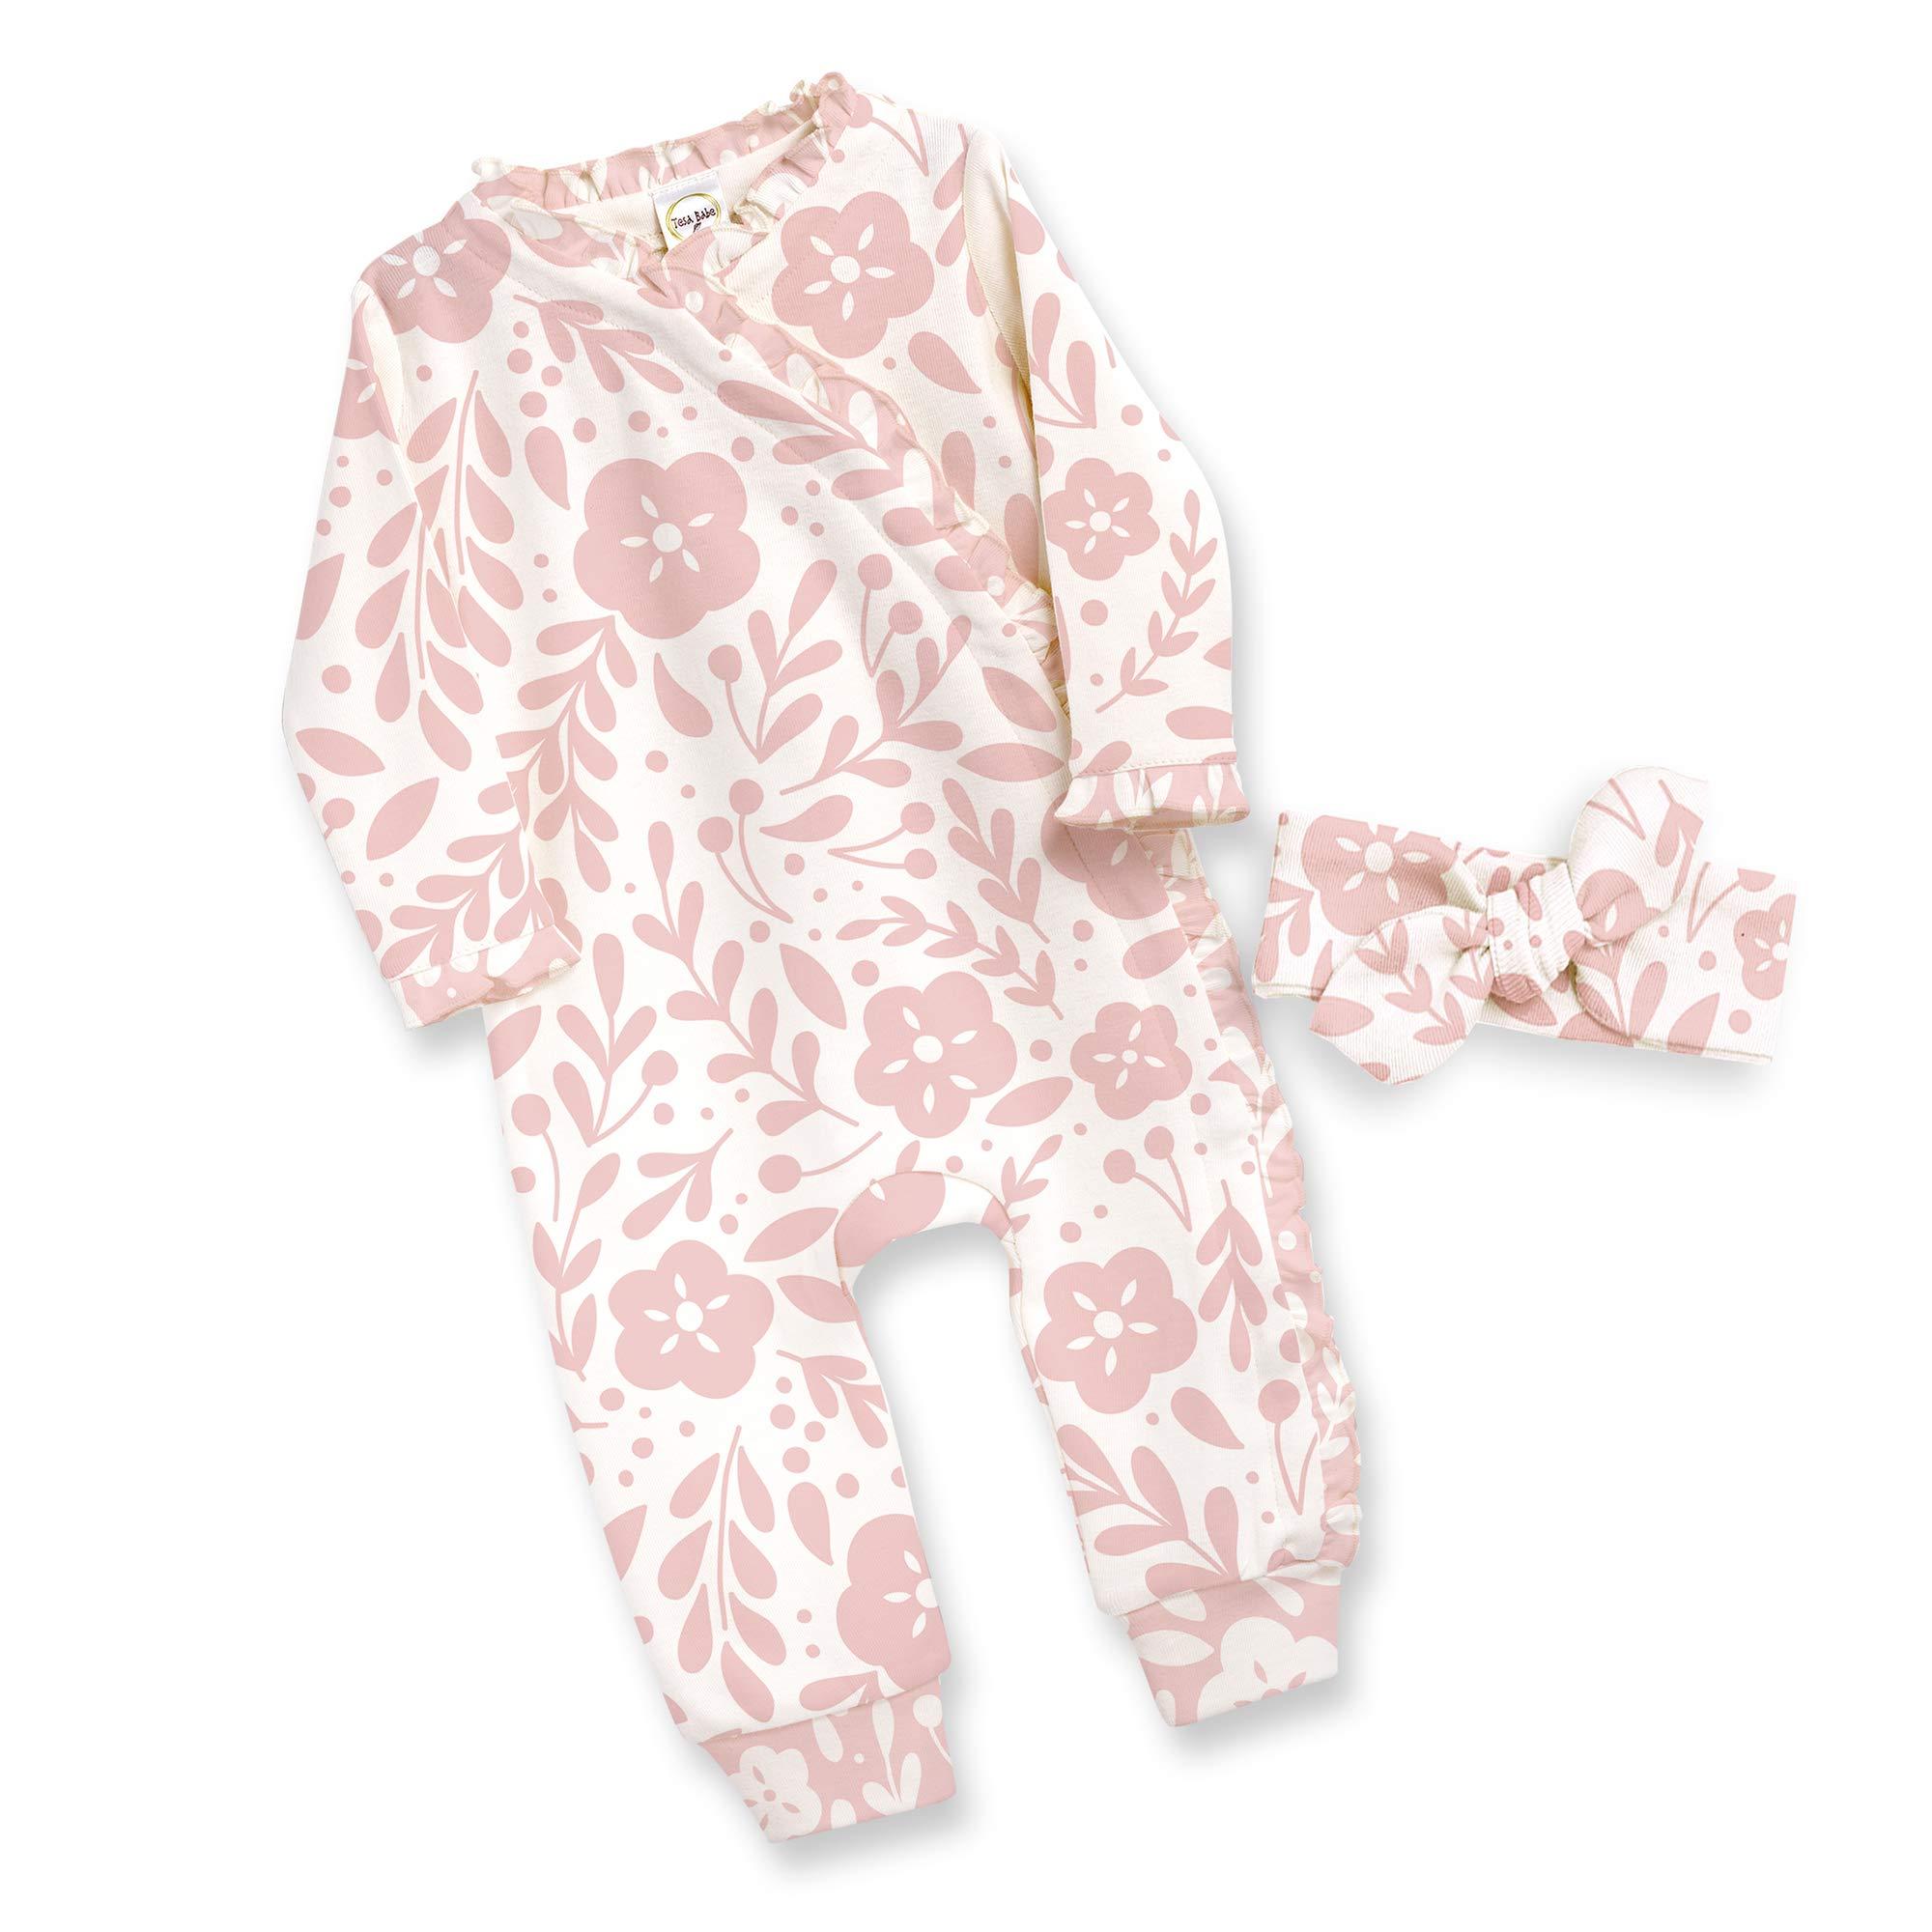 Tesa Babe Baby Girl Romper Gift Set for Newborns to Toddlers in Kimono + Headband, Multi